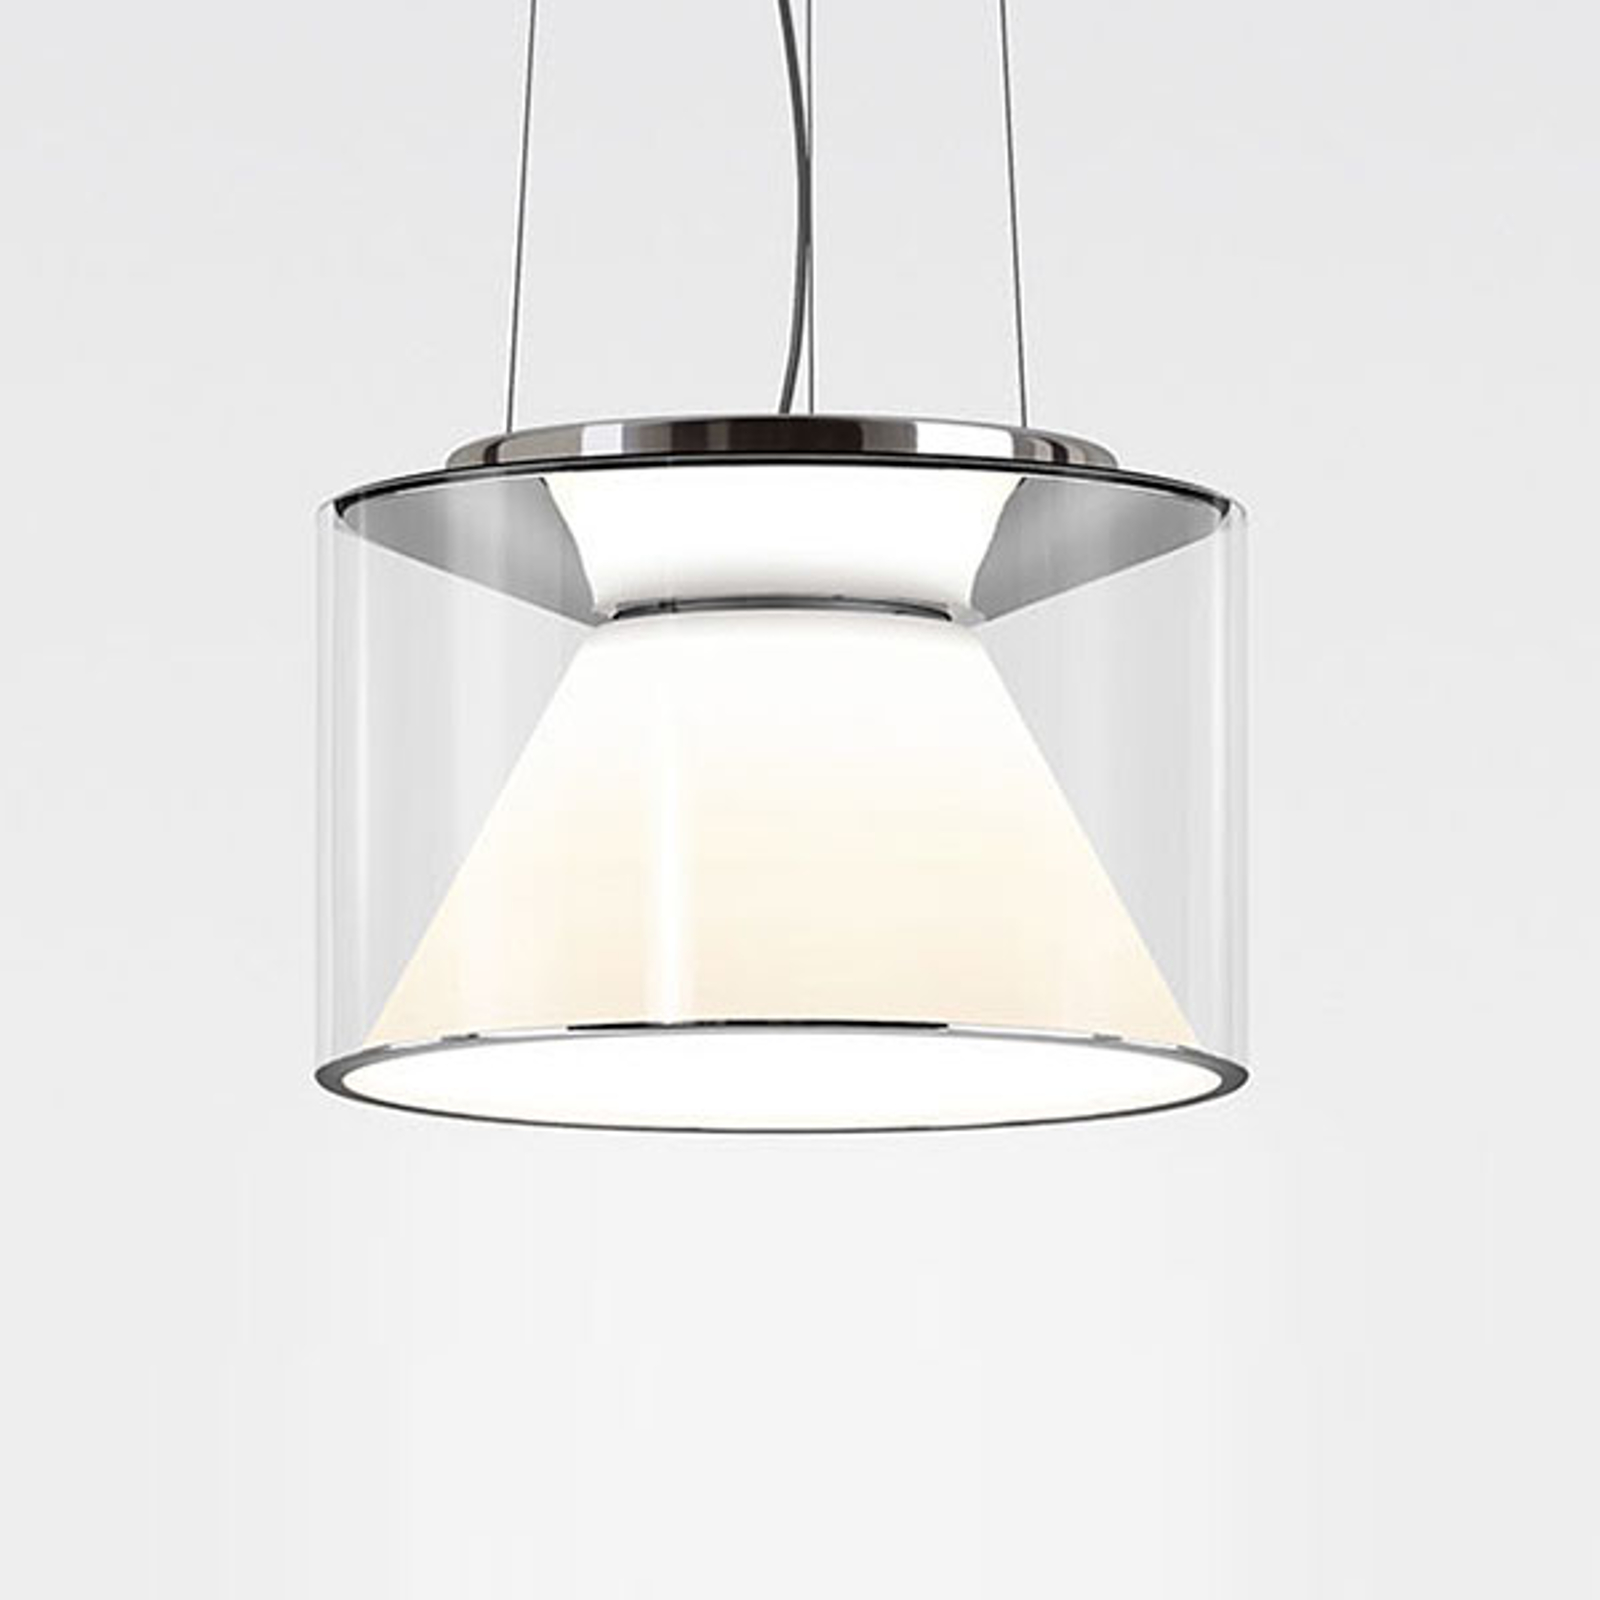 serien.lighting Drum M Pendel Seil 927 Triac flach